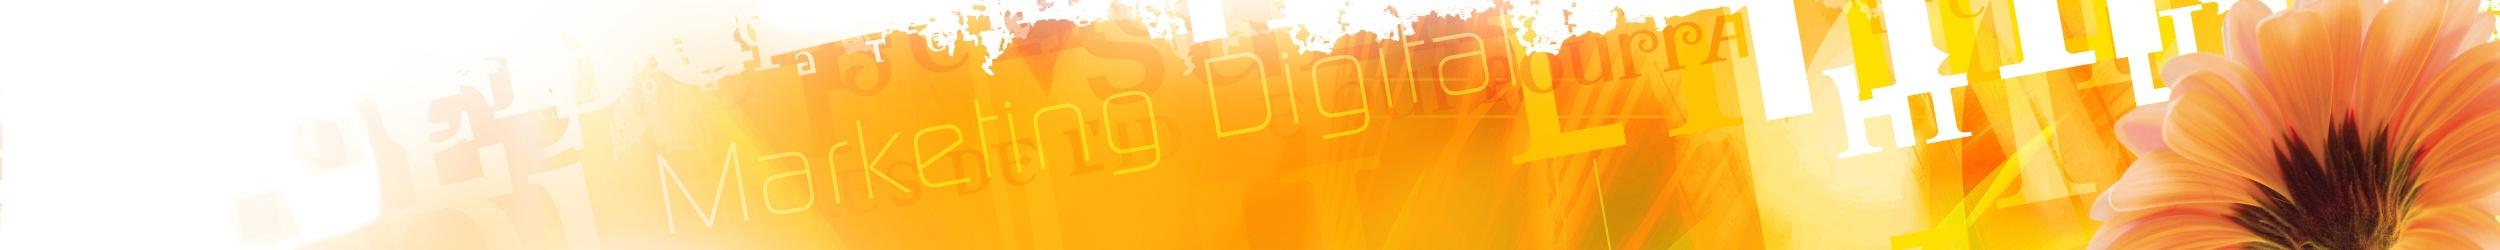 BRETTcom marketing digital